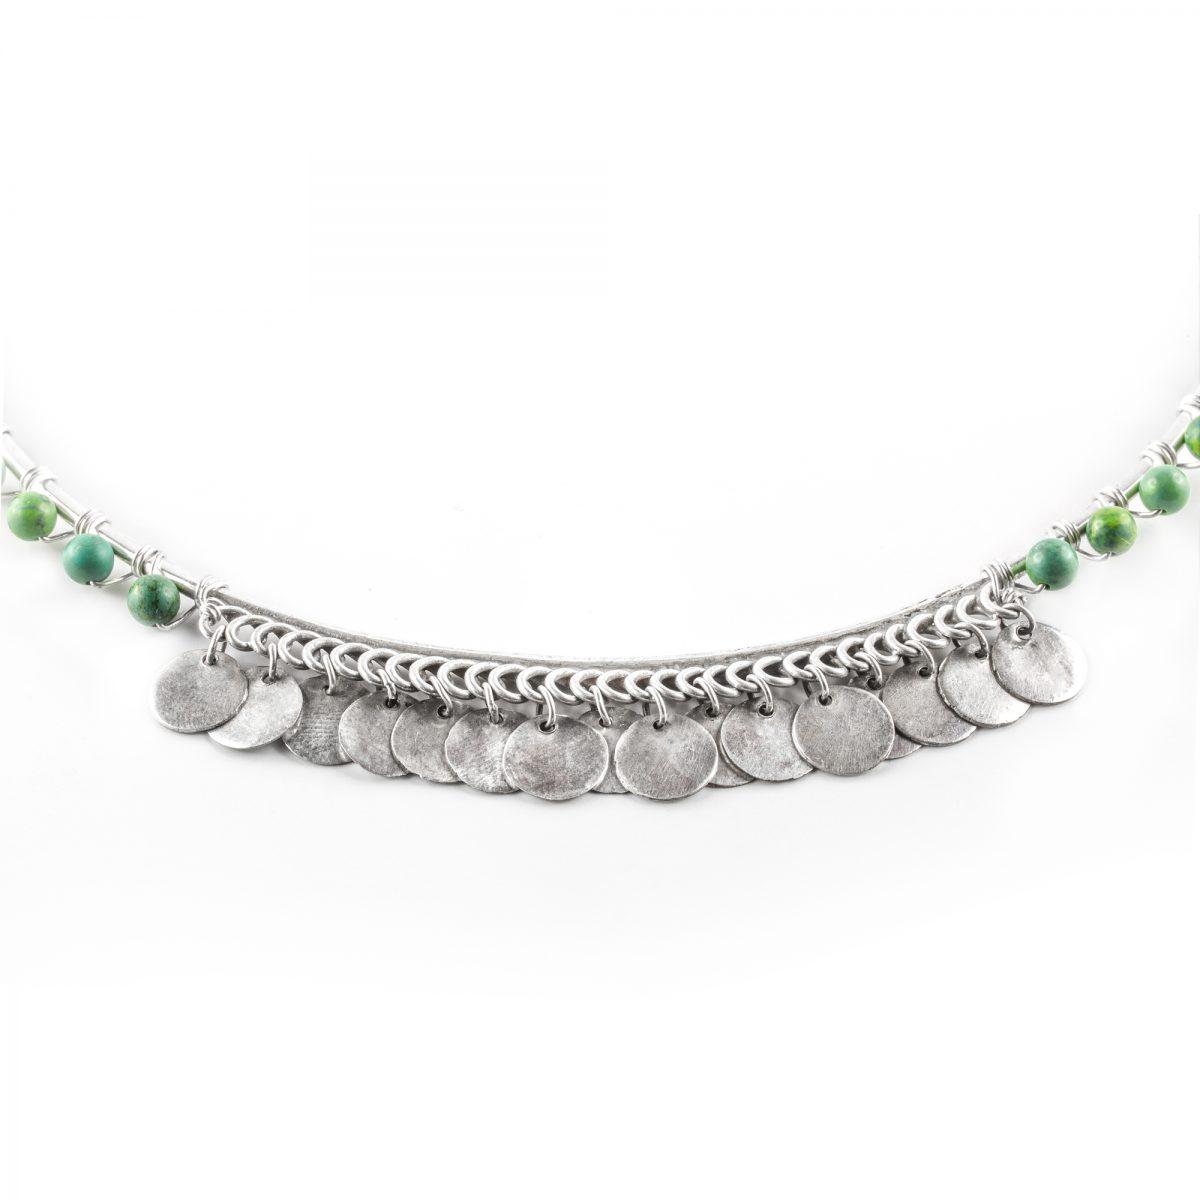 Collier Perle de Jade en pierre de turquoise et argent massif